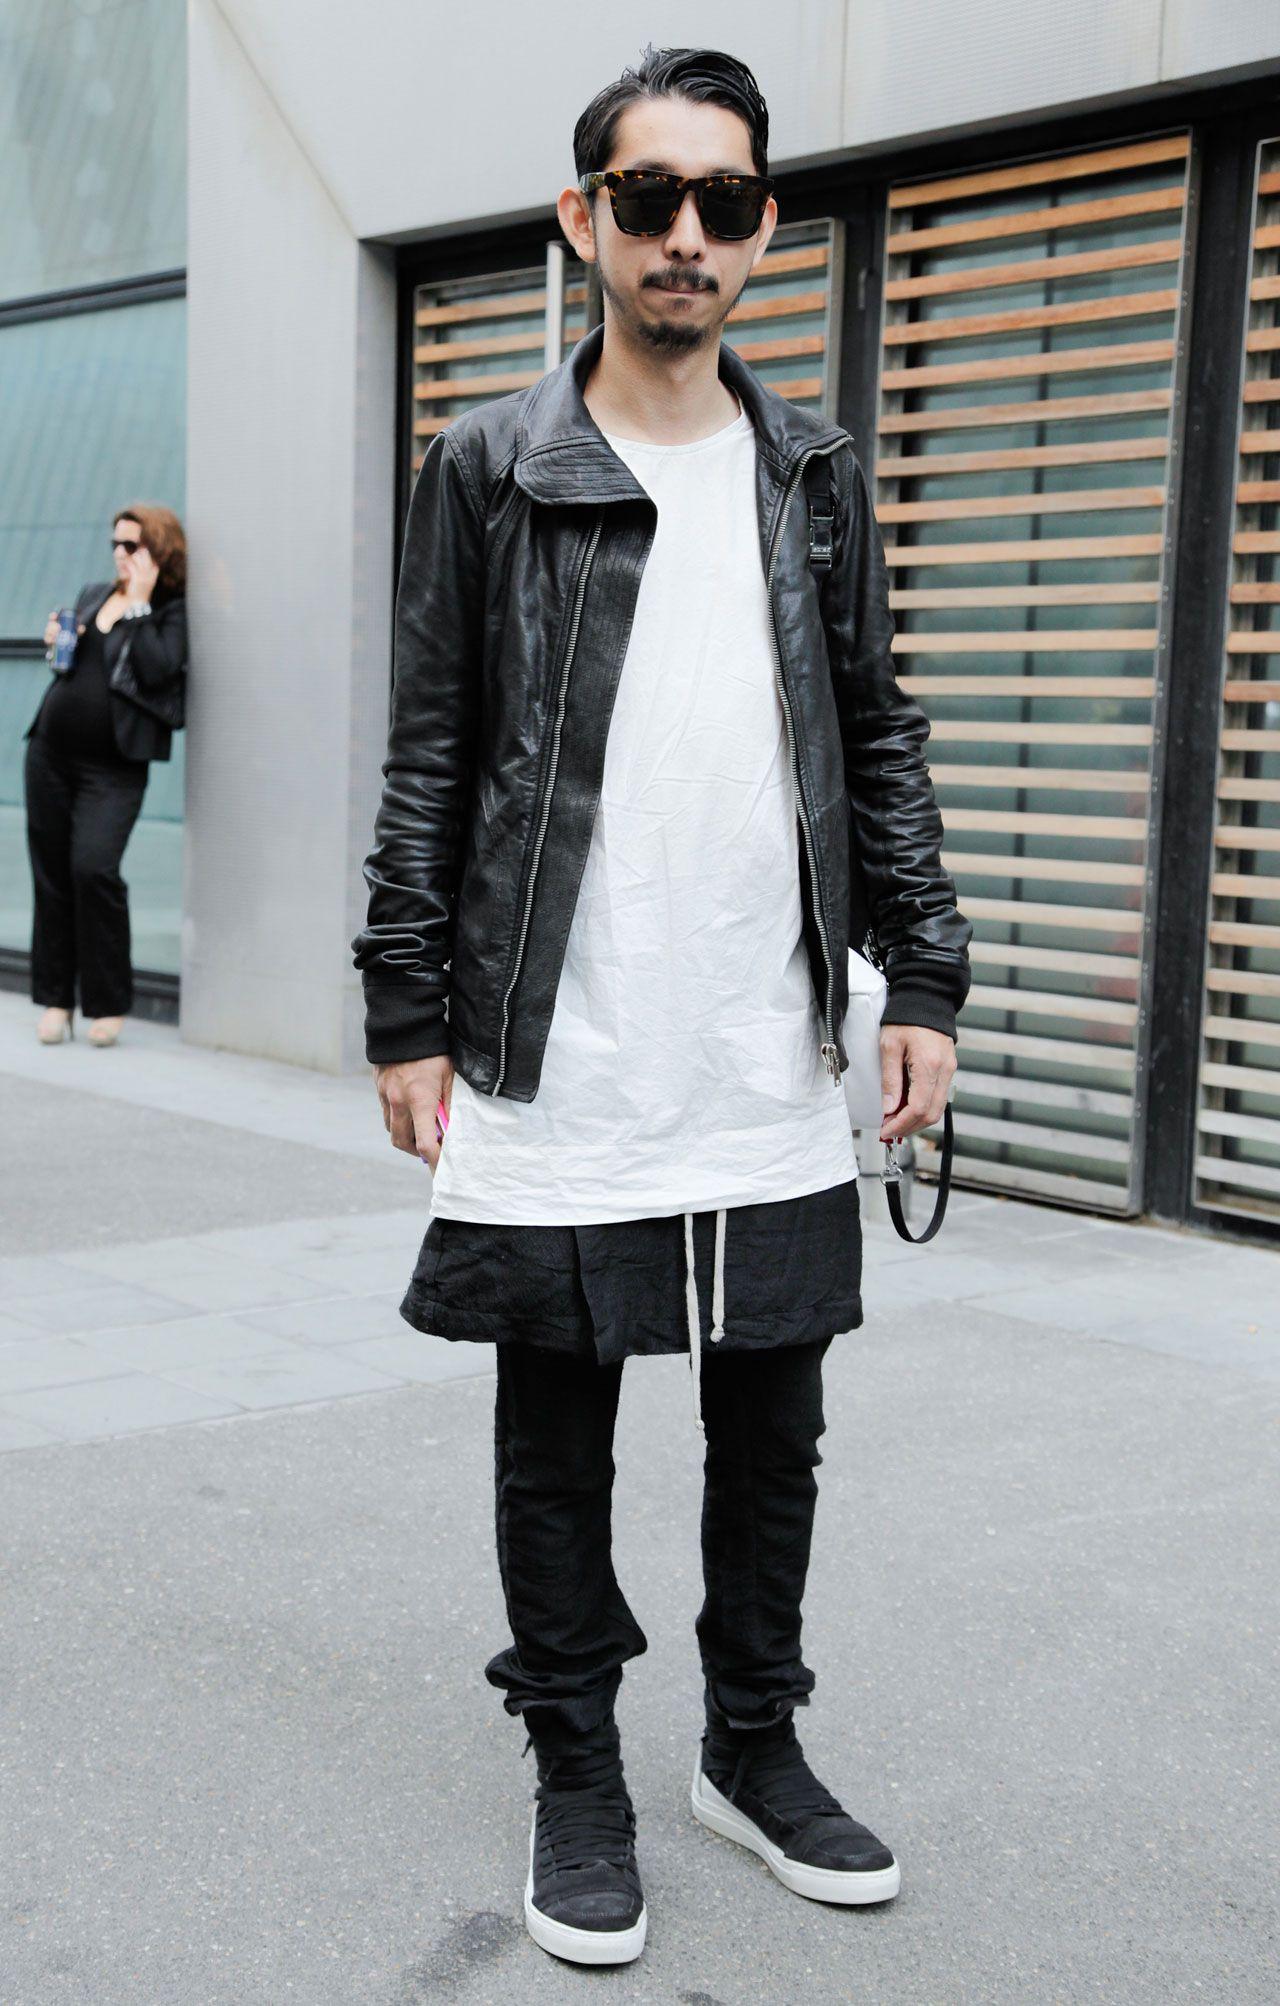 homens com saias (18) | Estilo M | Pinterest | Kilts, Mens skirt ...